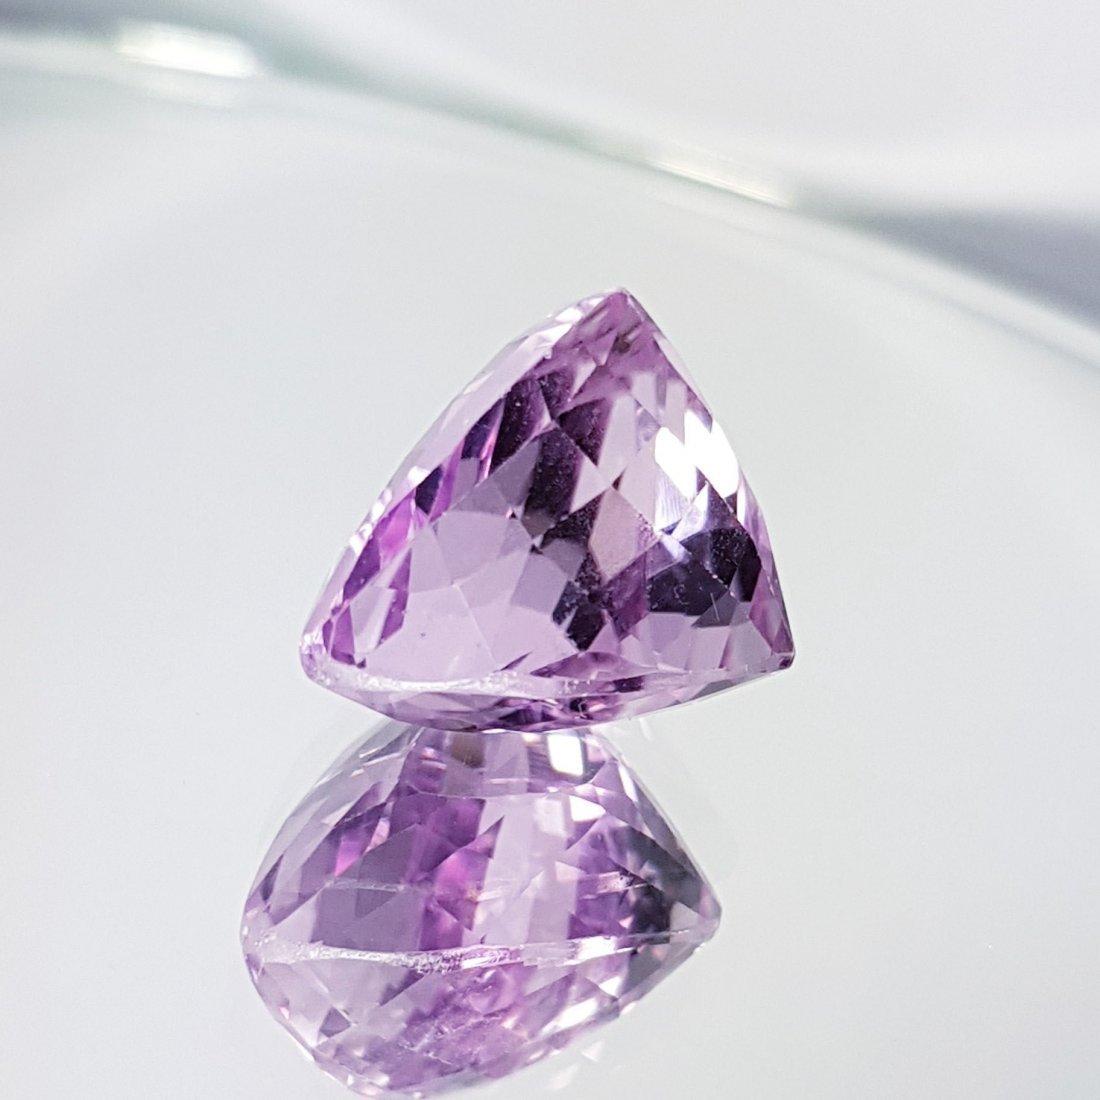 Pink Kunzite - 16.39 ct - 4